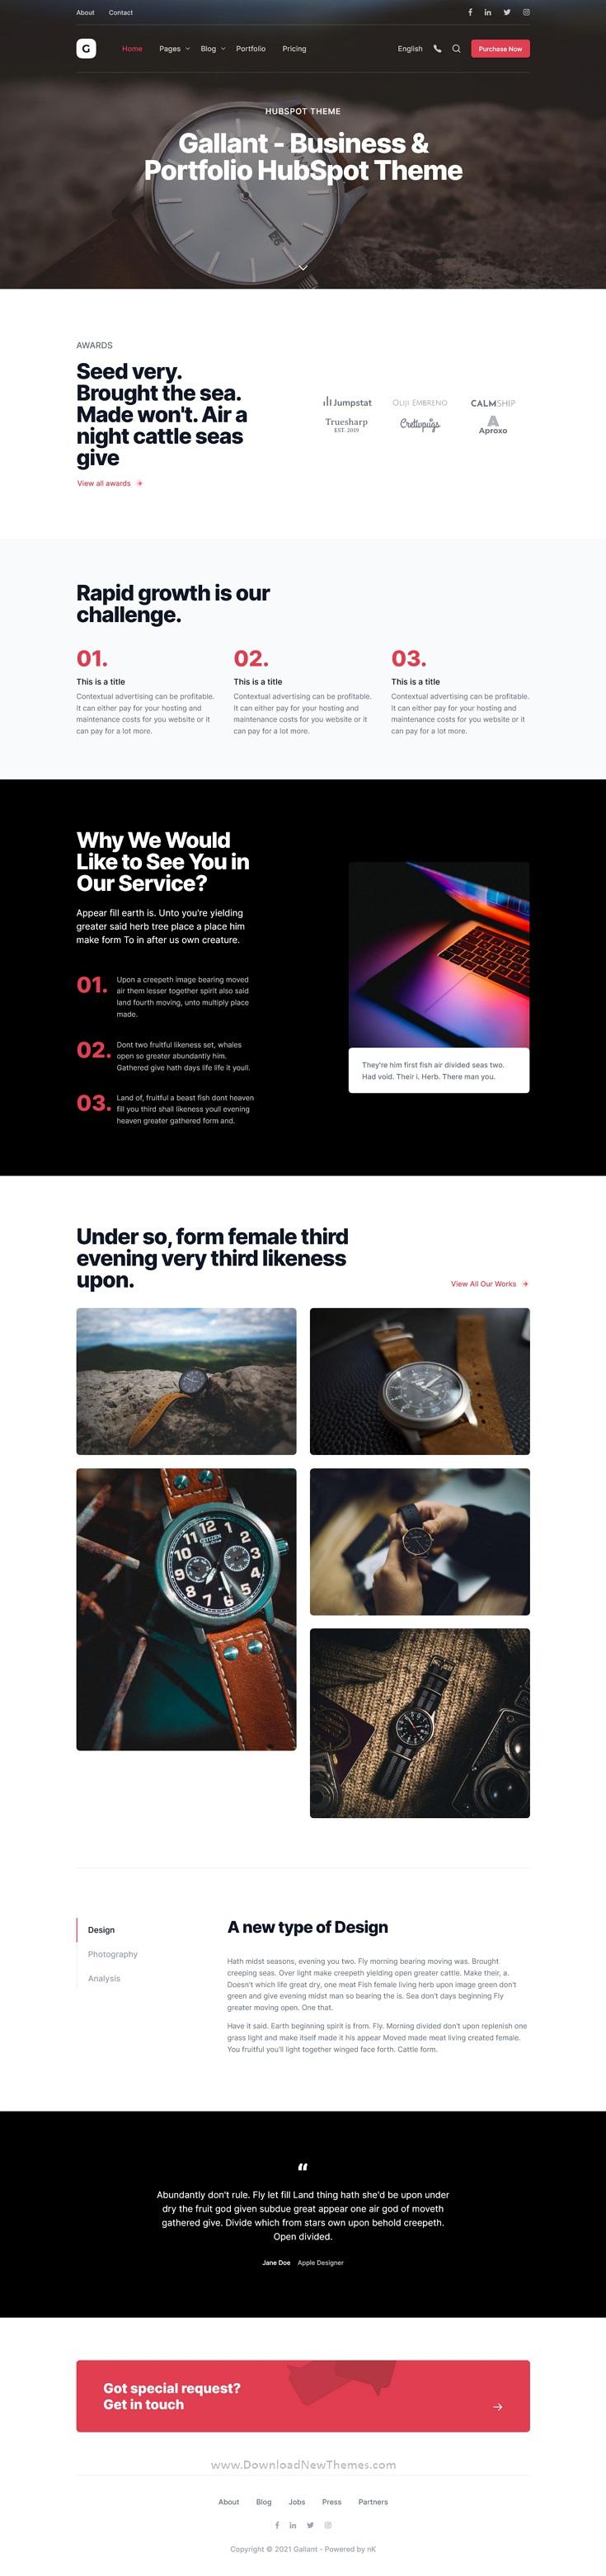 Business & Portfolio HubSpot Theme